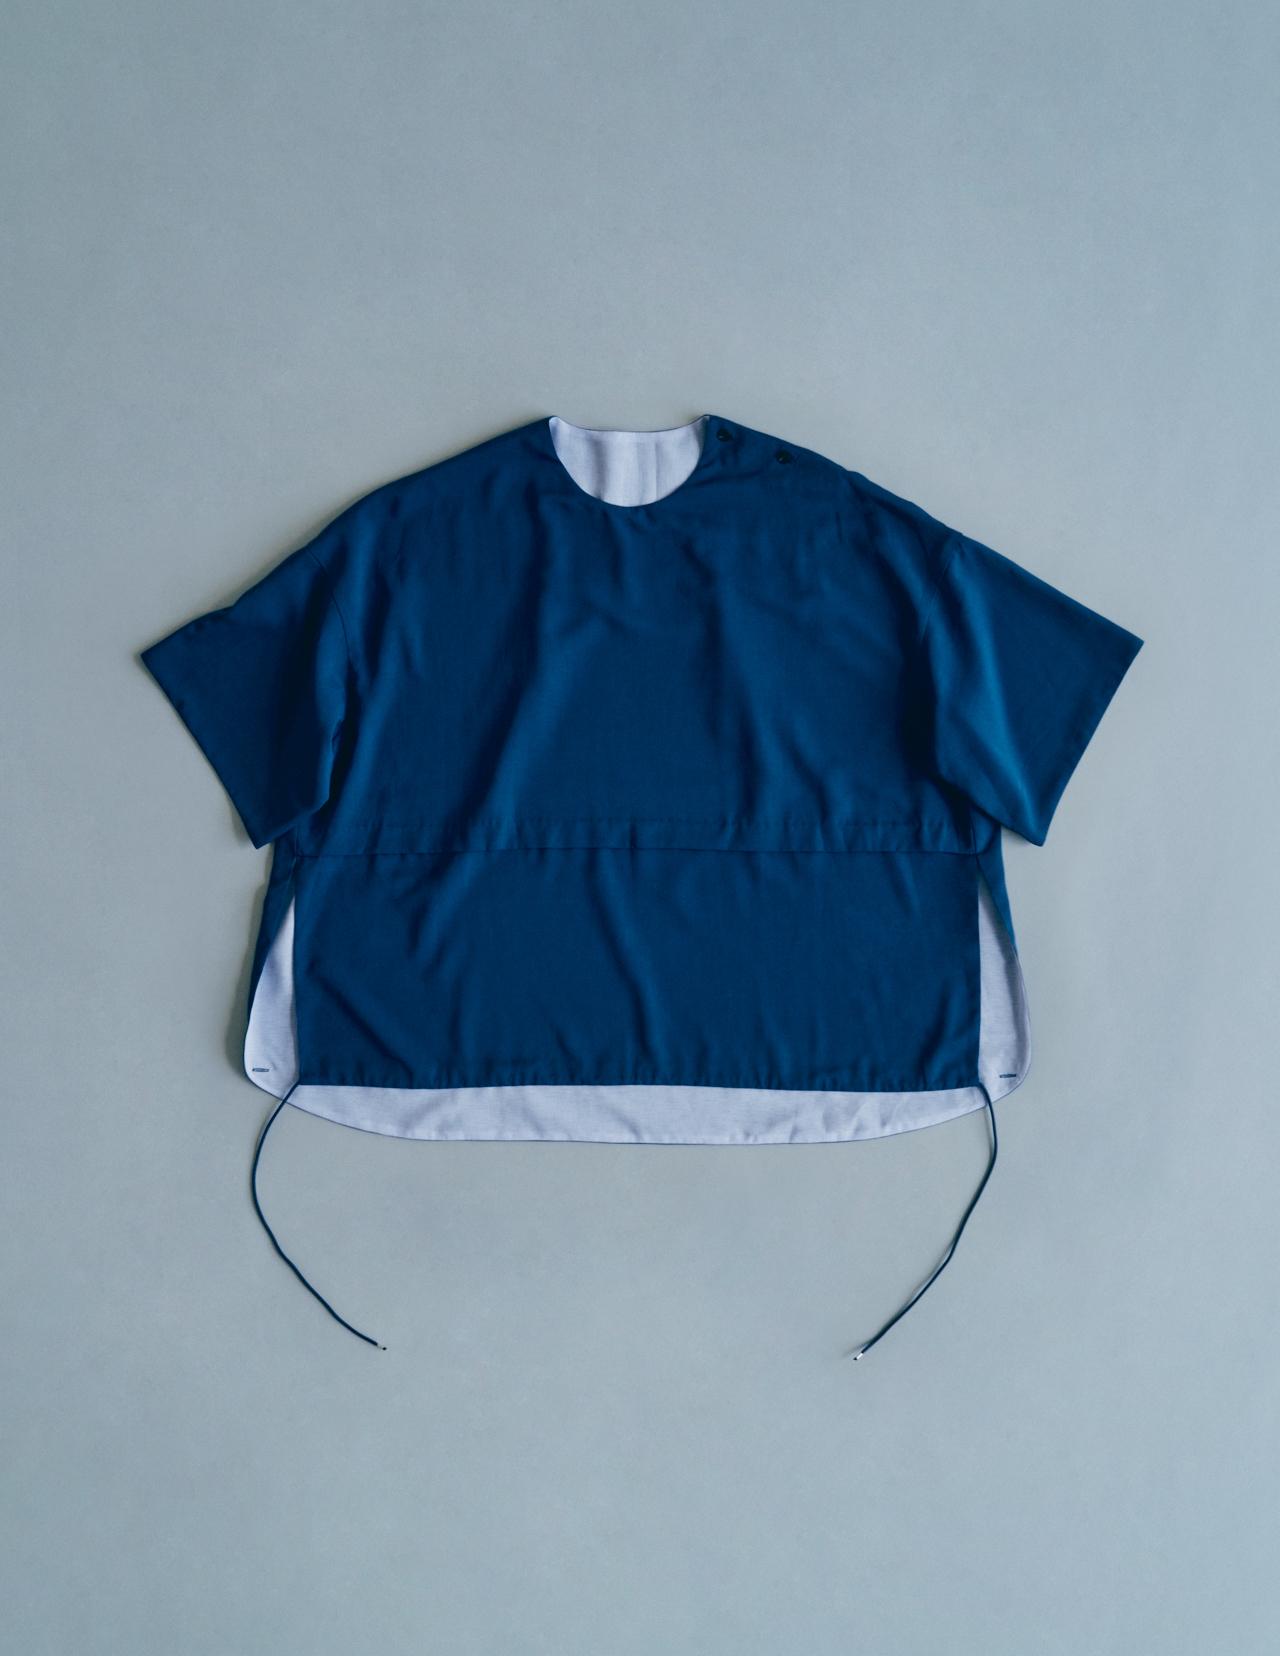 [ATAMI 'n' TOKYO×BEDORO] Pullover Tops - スイチュウ